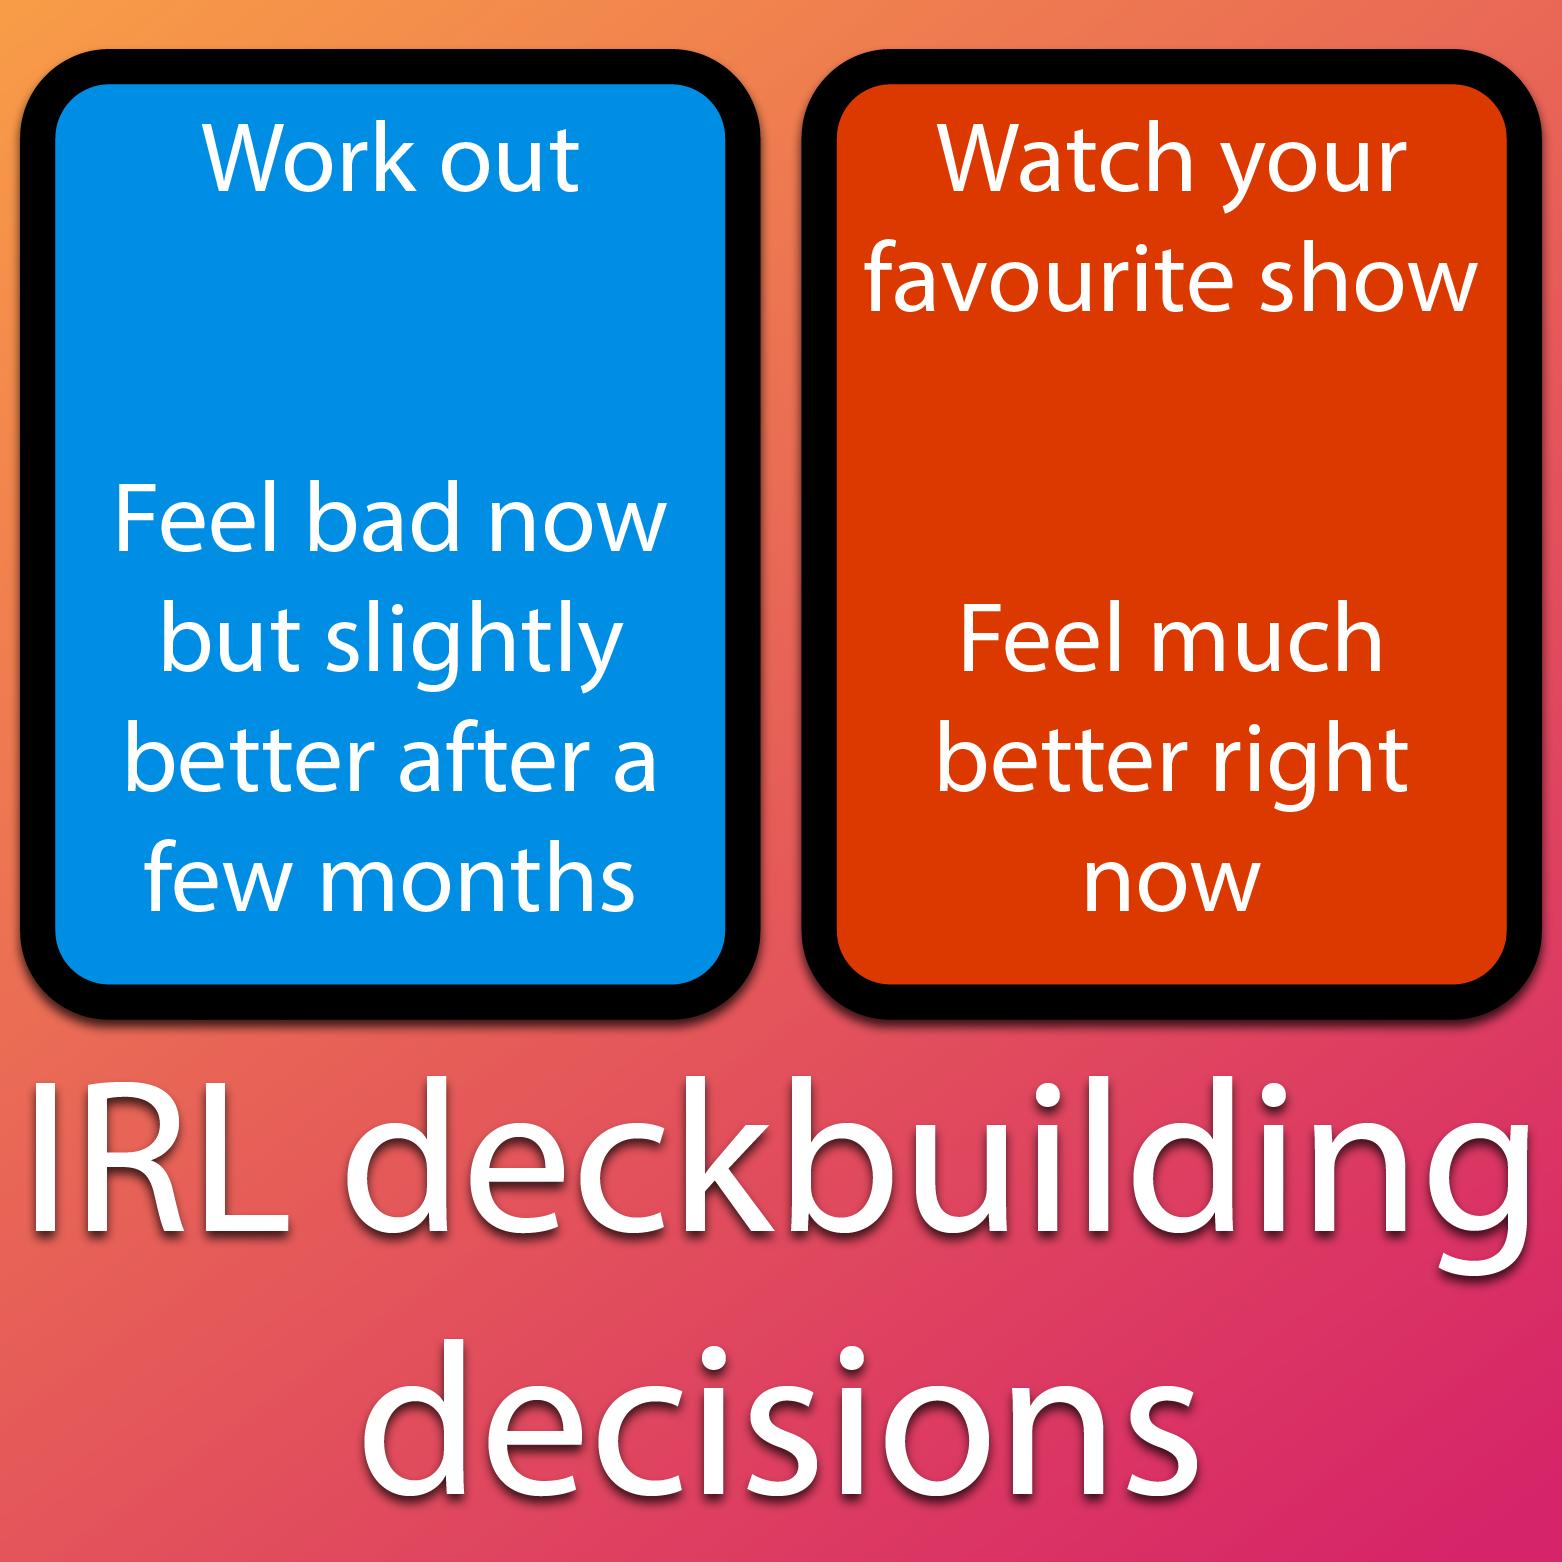 irl deckbuilding.png